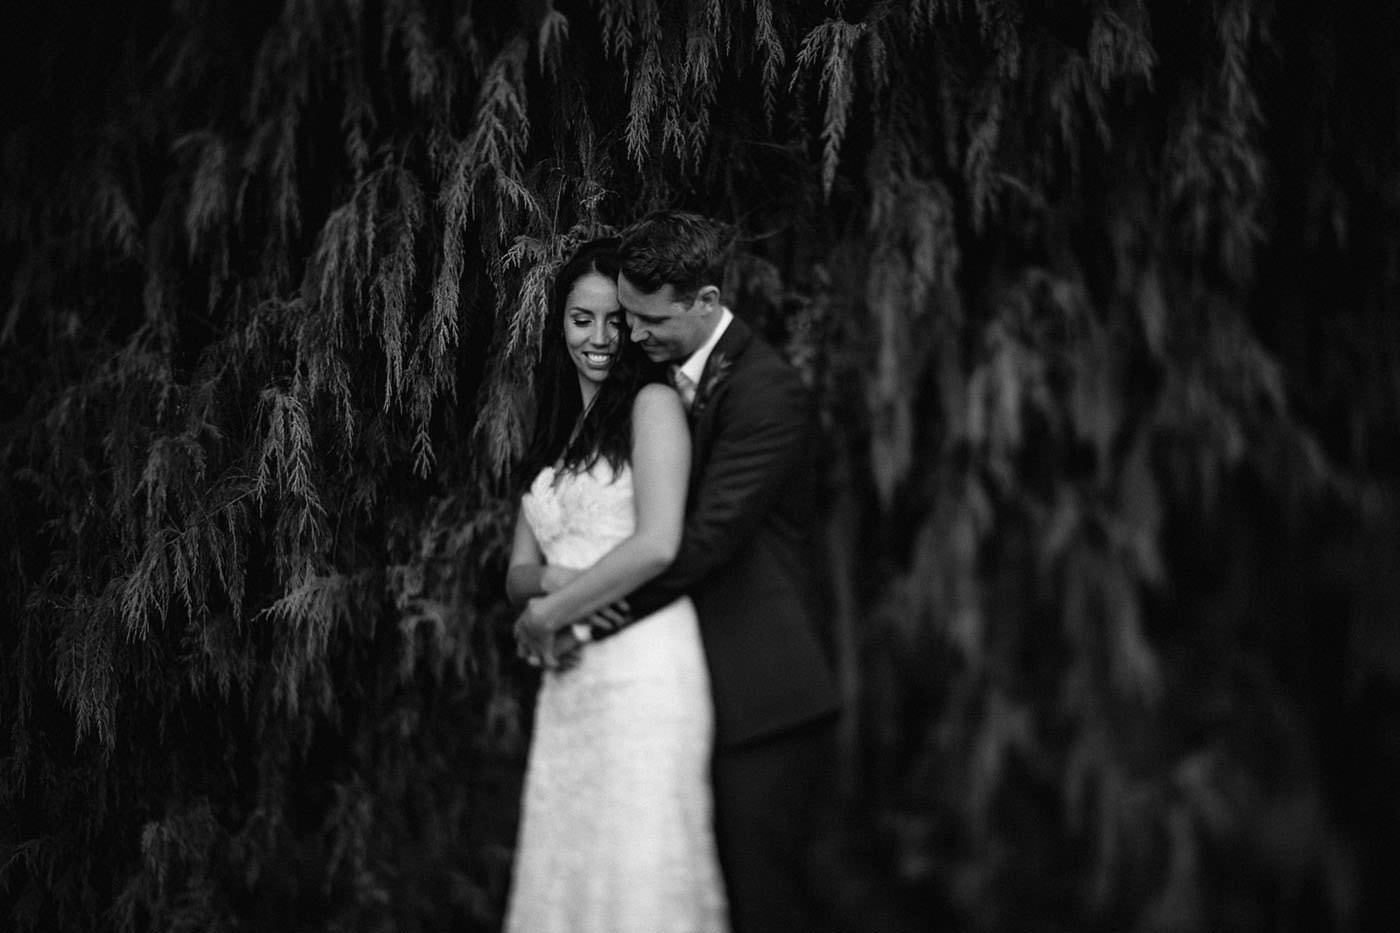 wedding_photographer_nz-00026.jpg